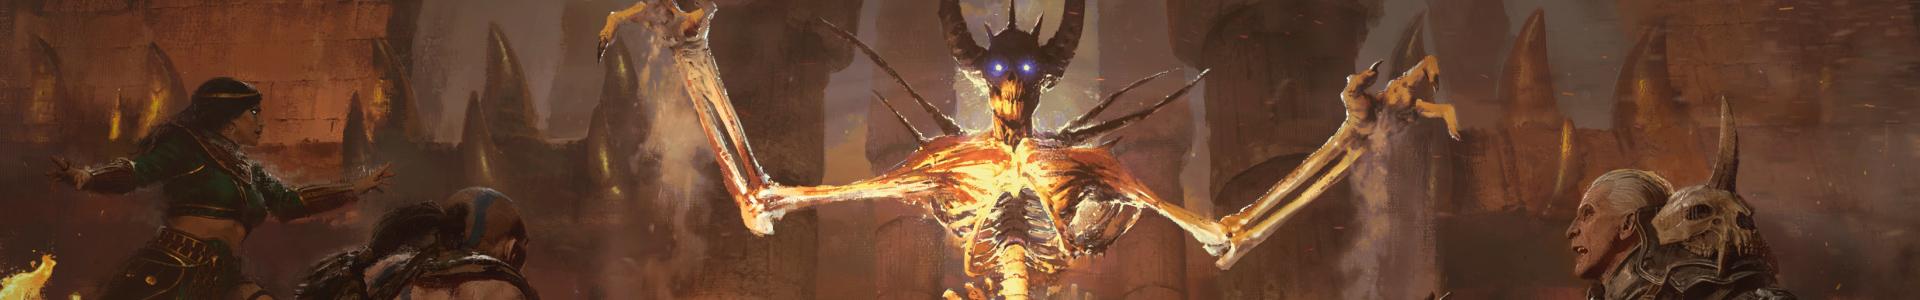 Banner media of Diablo II: Resurrected – Technical Alpha video game.